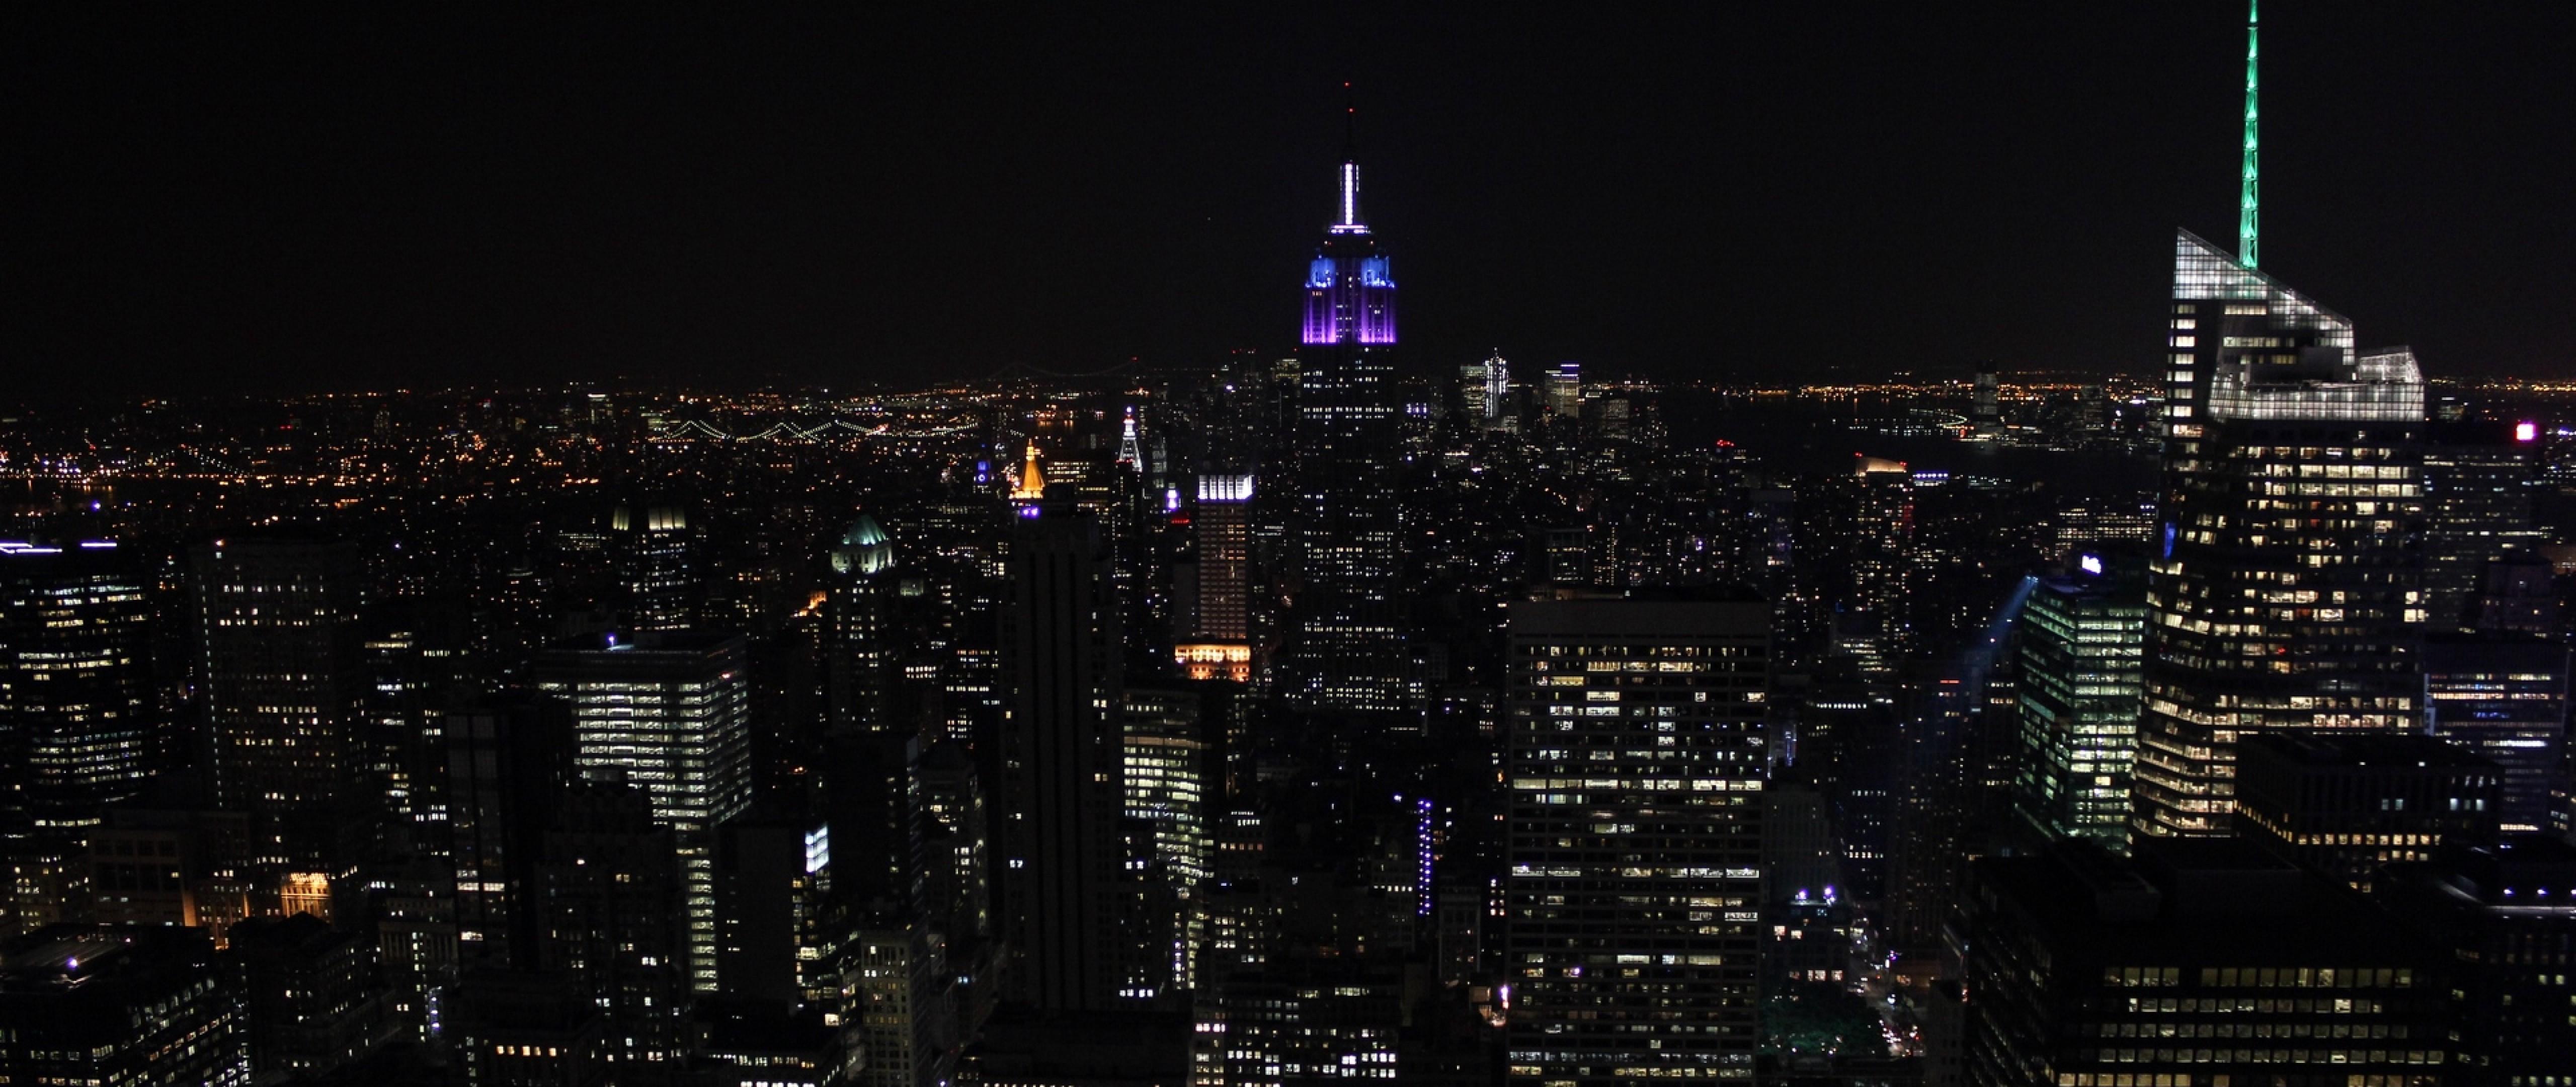 New York Wallpaper 4k Posted By Christopher Walker